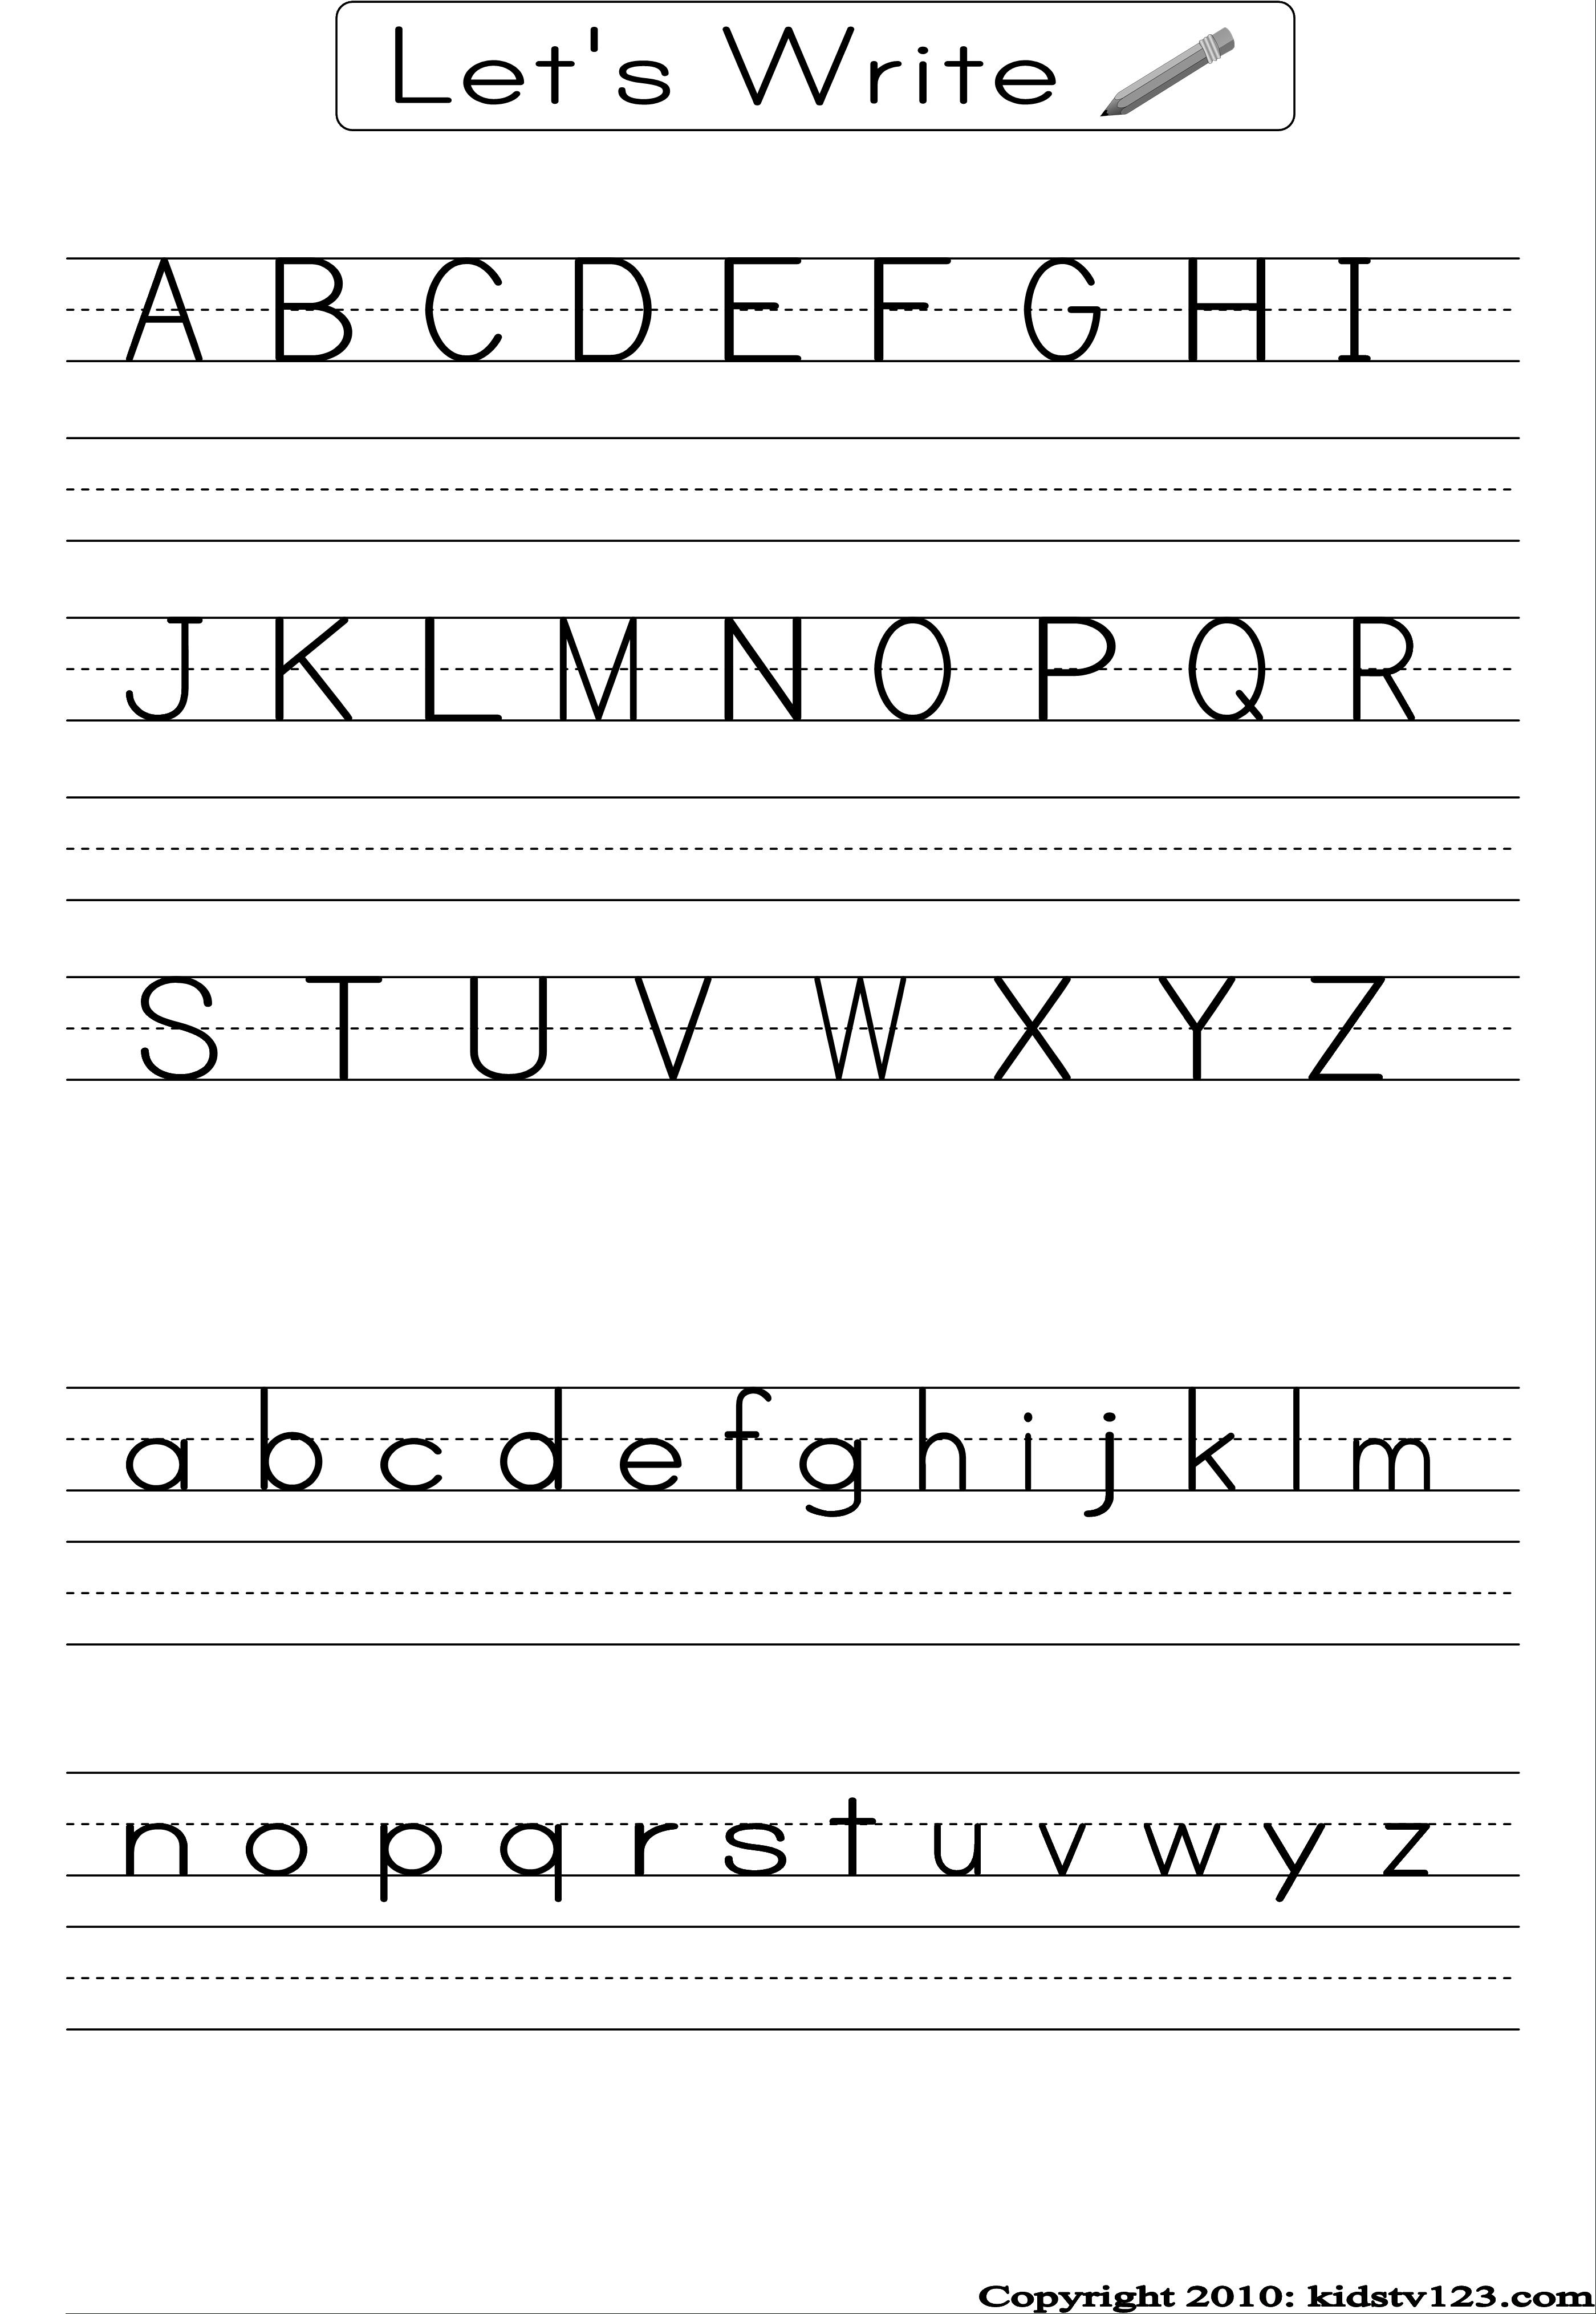 Free Printable Alphabet Worksheets, Preschool Writing And Pattern - Hooked On Phonics Free Printable Worksheets